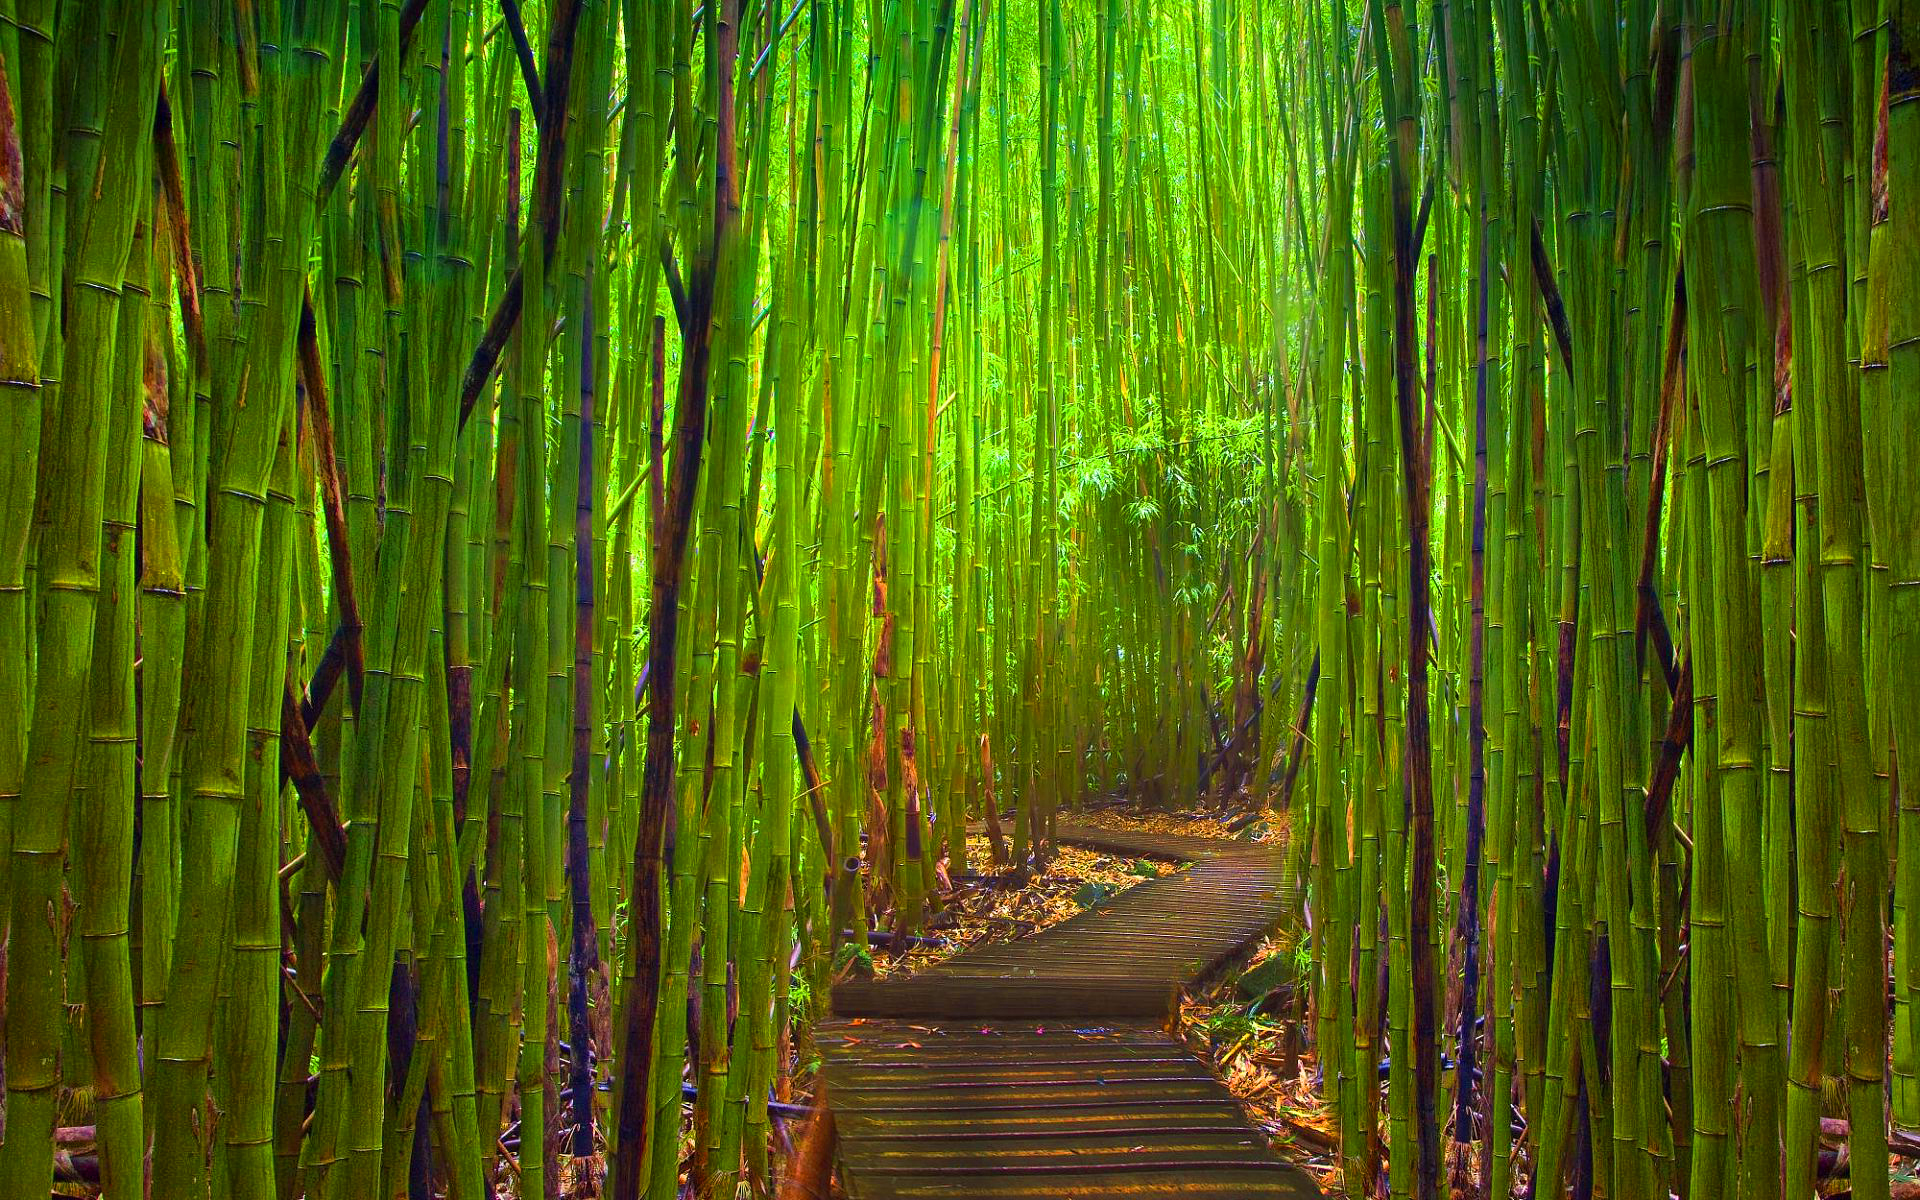 Duurzame kleding van bamboe